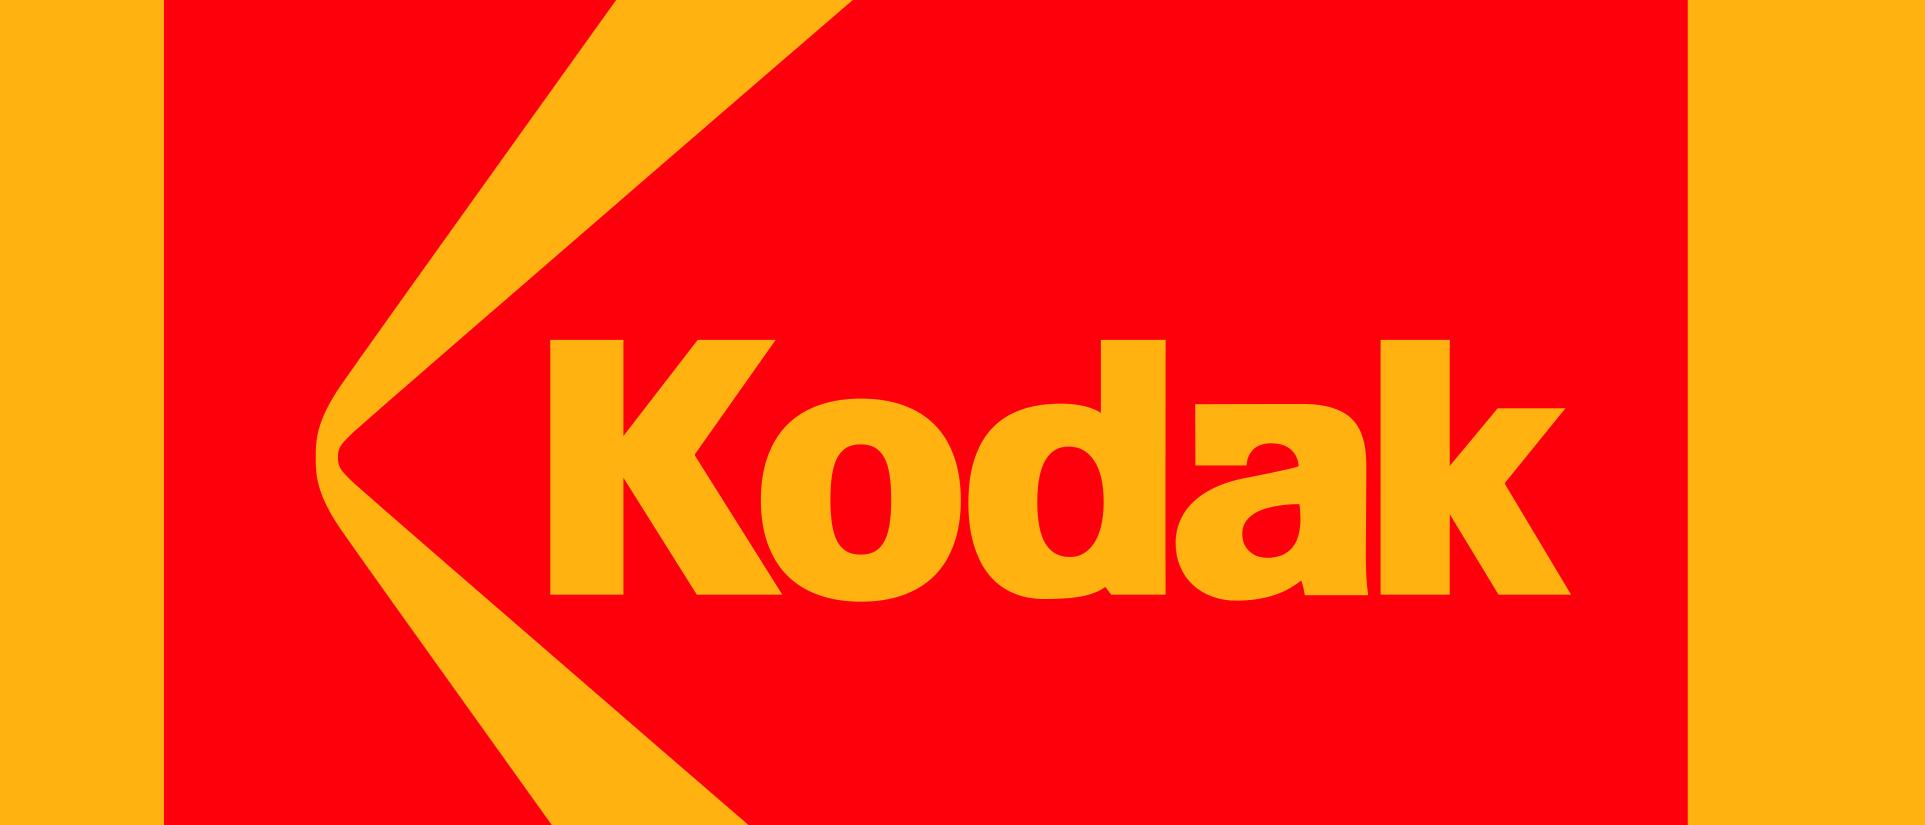 foto-colore-kodak logo